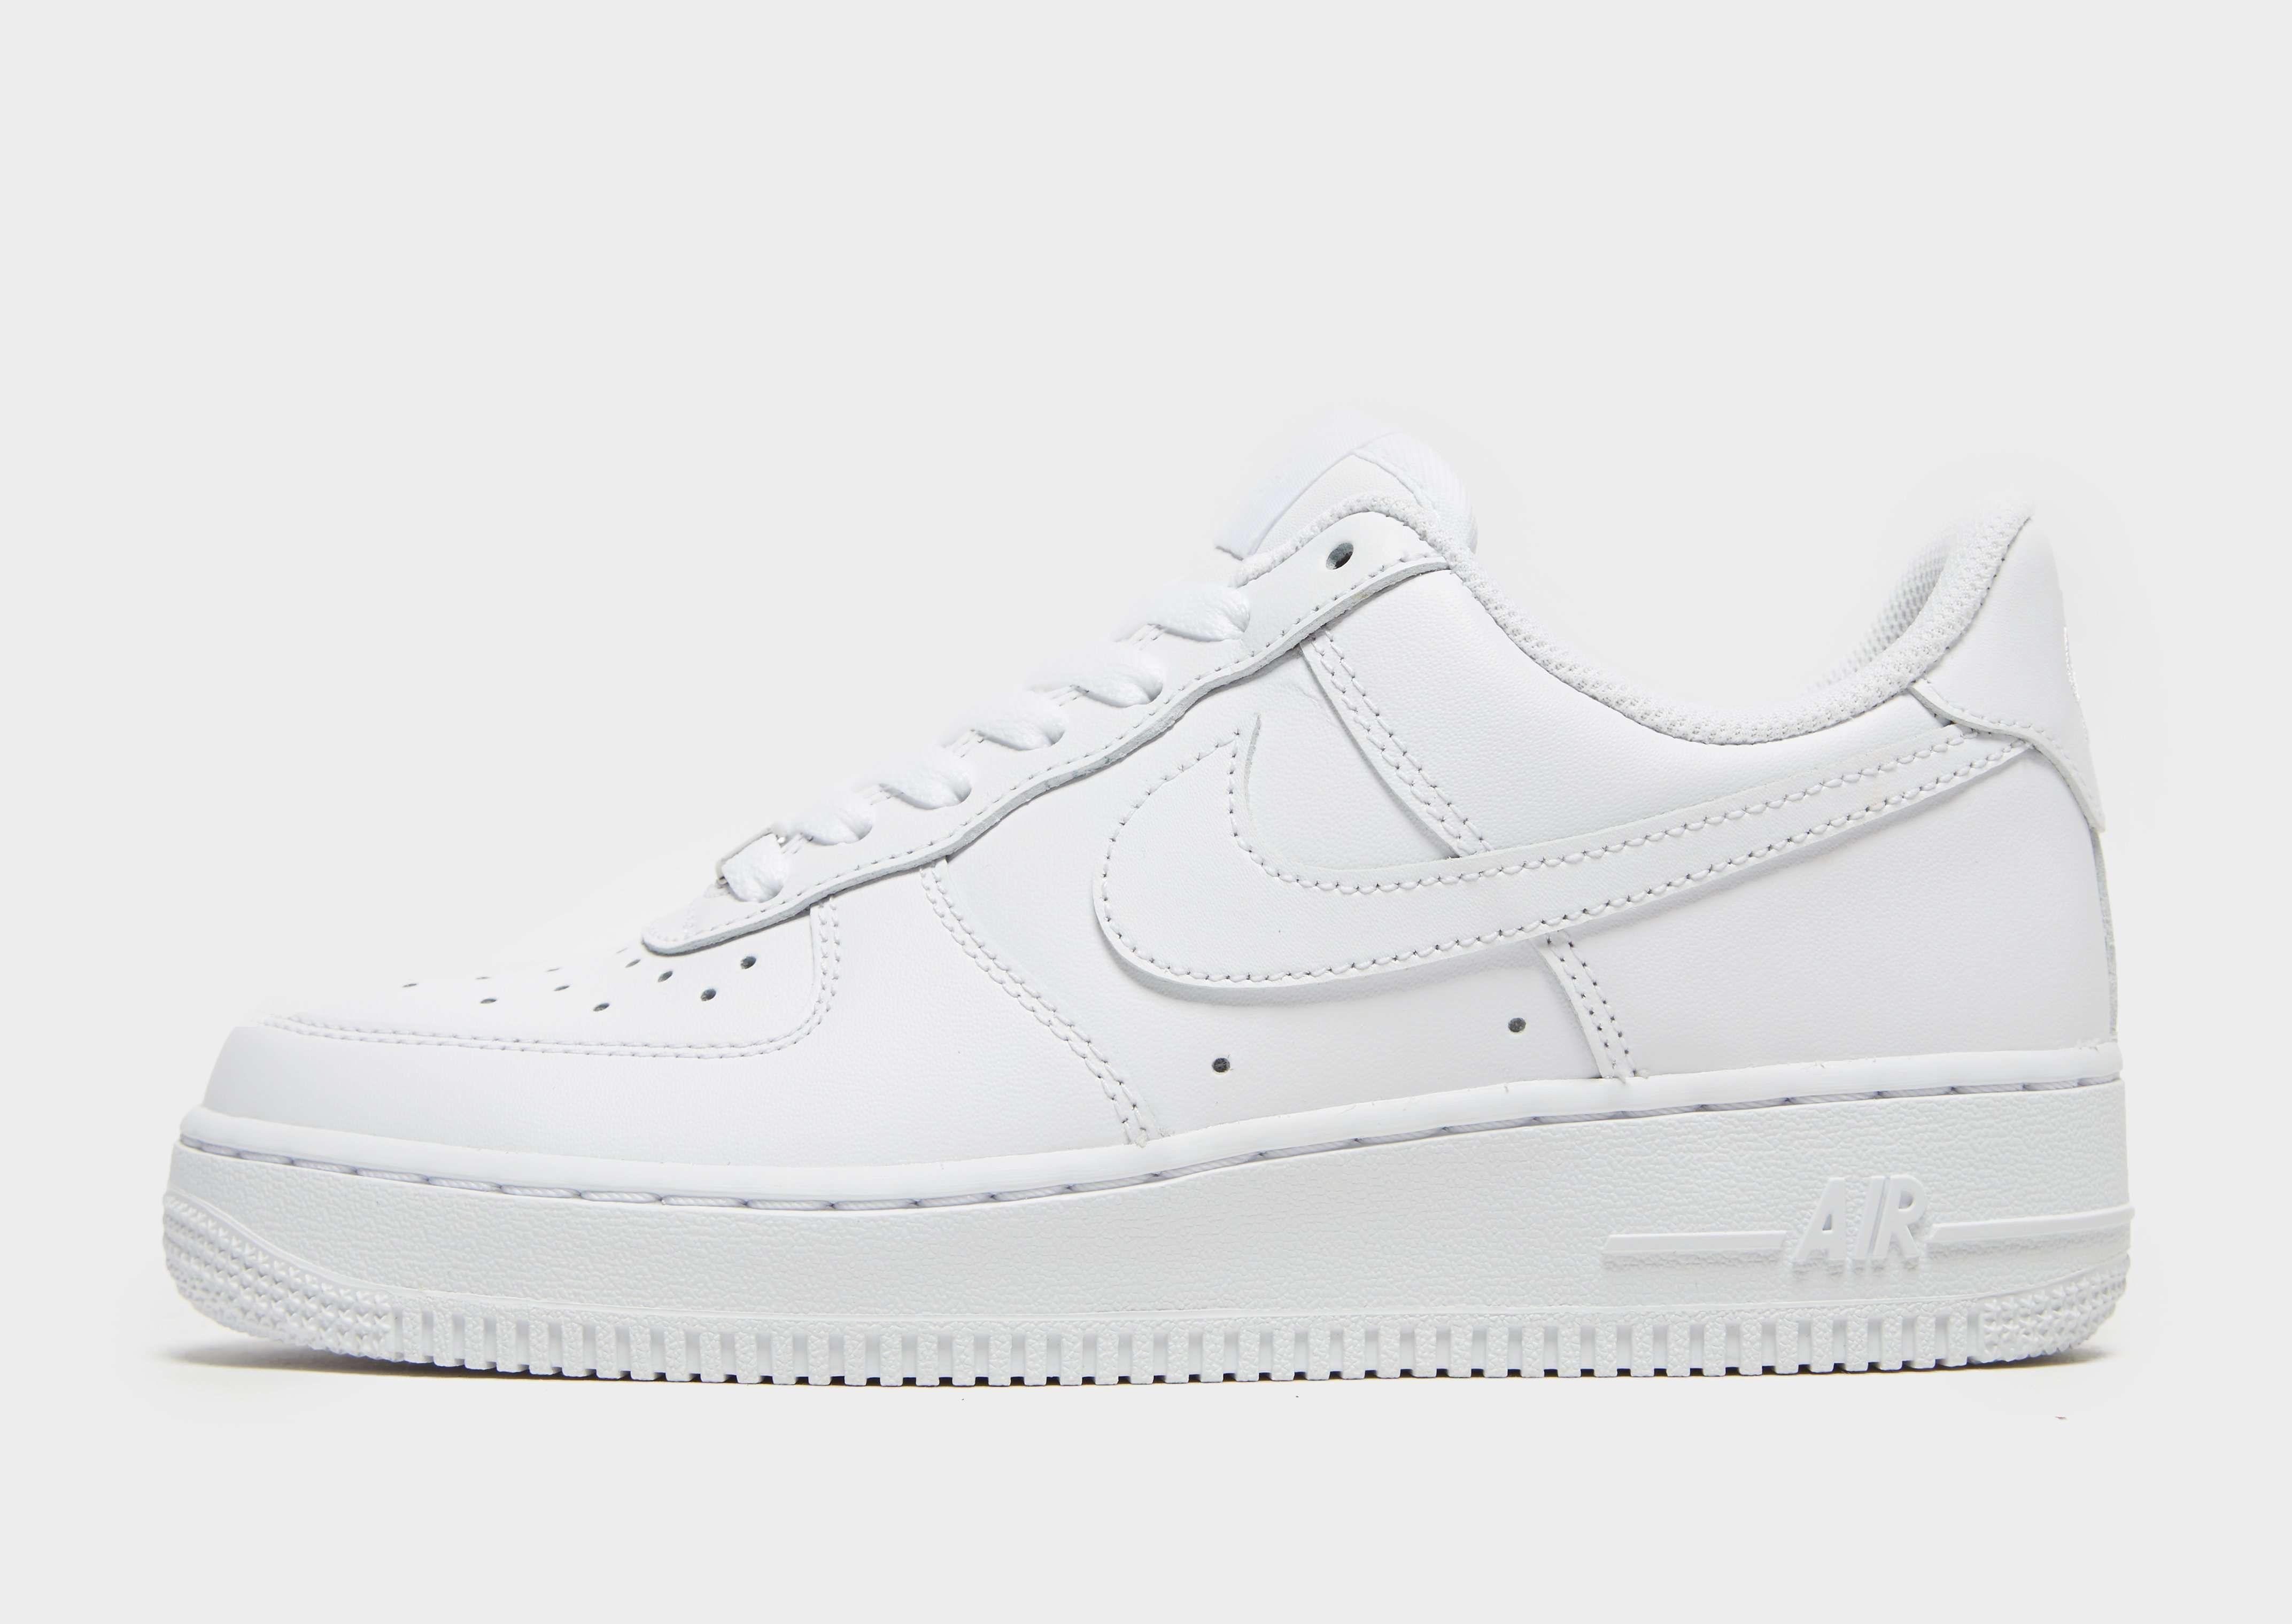 Buy White Nike Air Force 1 Low Womens | Nike air force, Nike ...